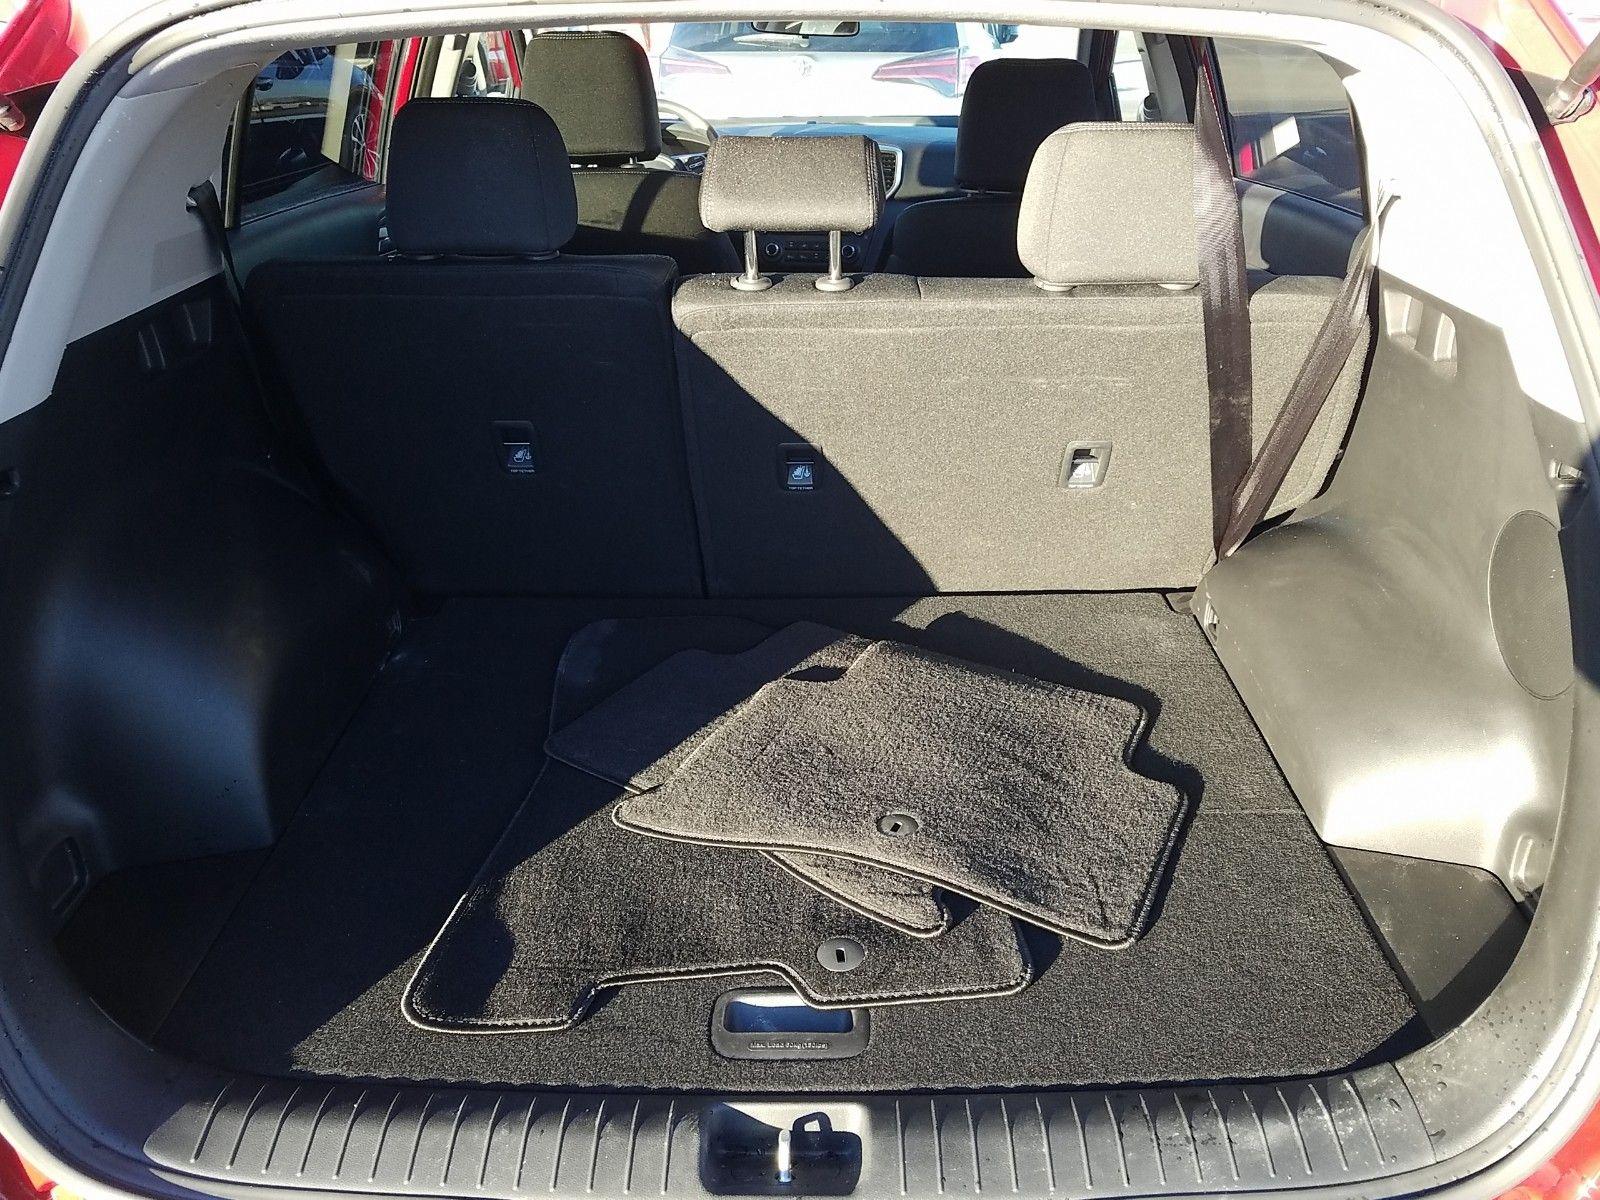 2020 KIA SPORTAGE FWD 4C LX - 7